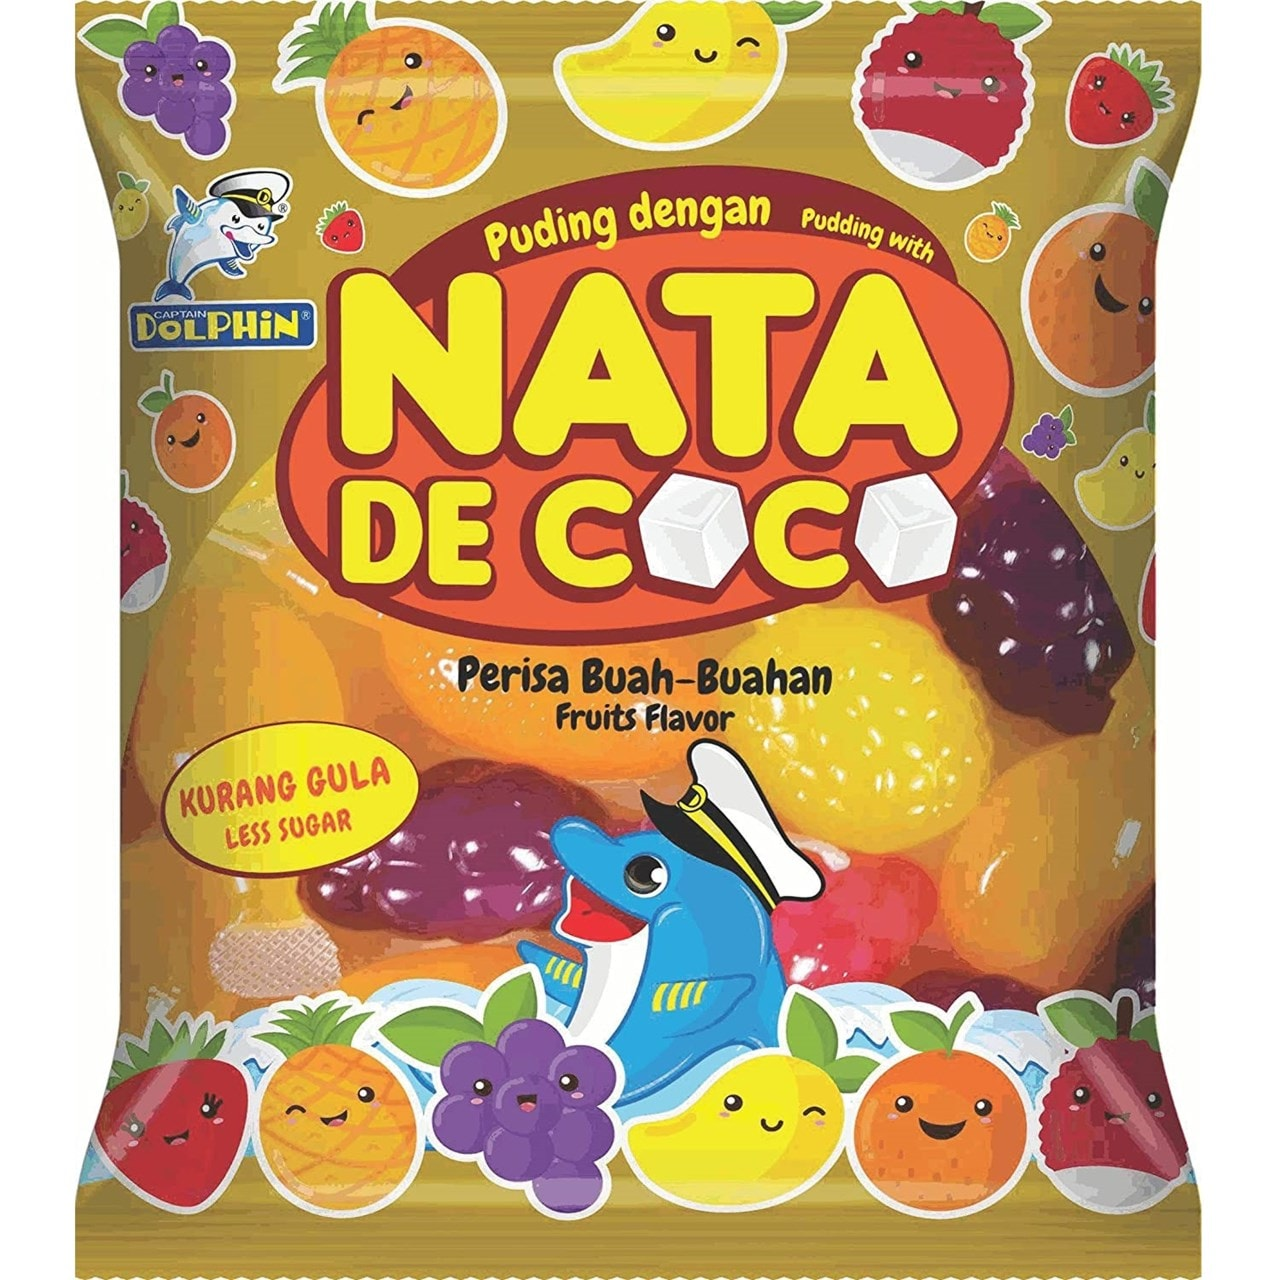 Nata De Coco Pudding: Assorted Fruit Flavour Jellies: Case Of 6 (12 Jellies Per Bag) - 1